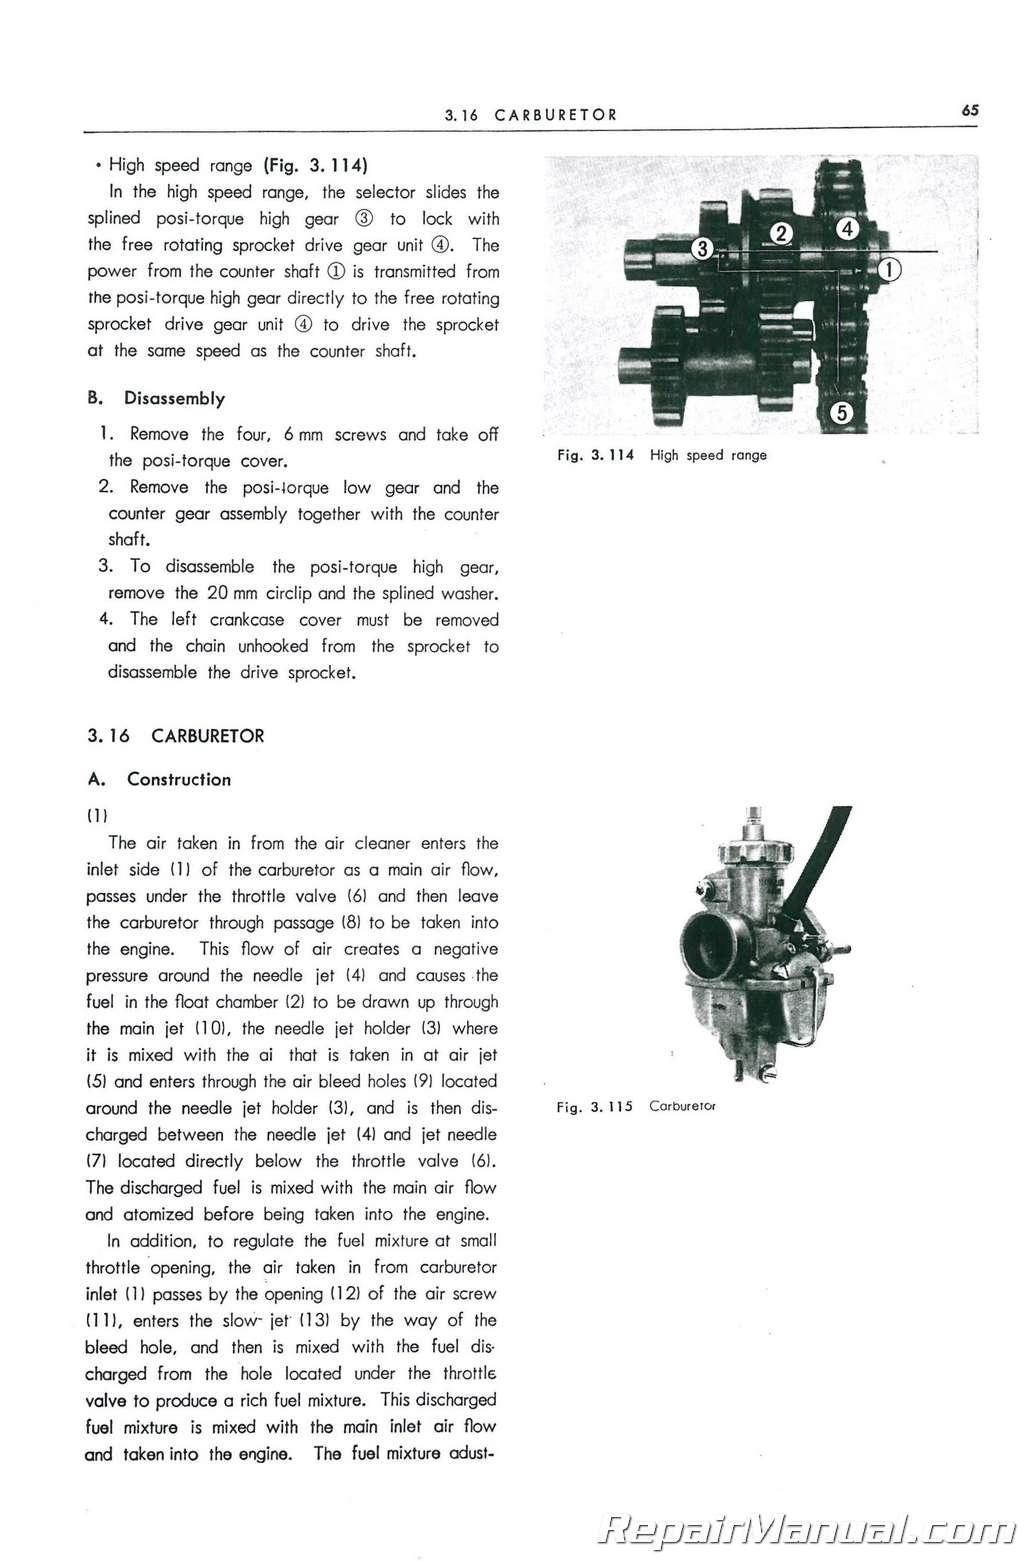 Magnificent 64 Honda S90 Wiring Diagram Wiring Library Wiring 101 Vieworaxxcnl